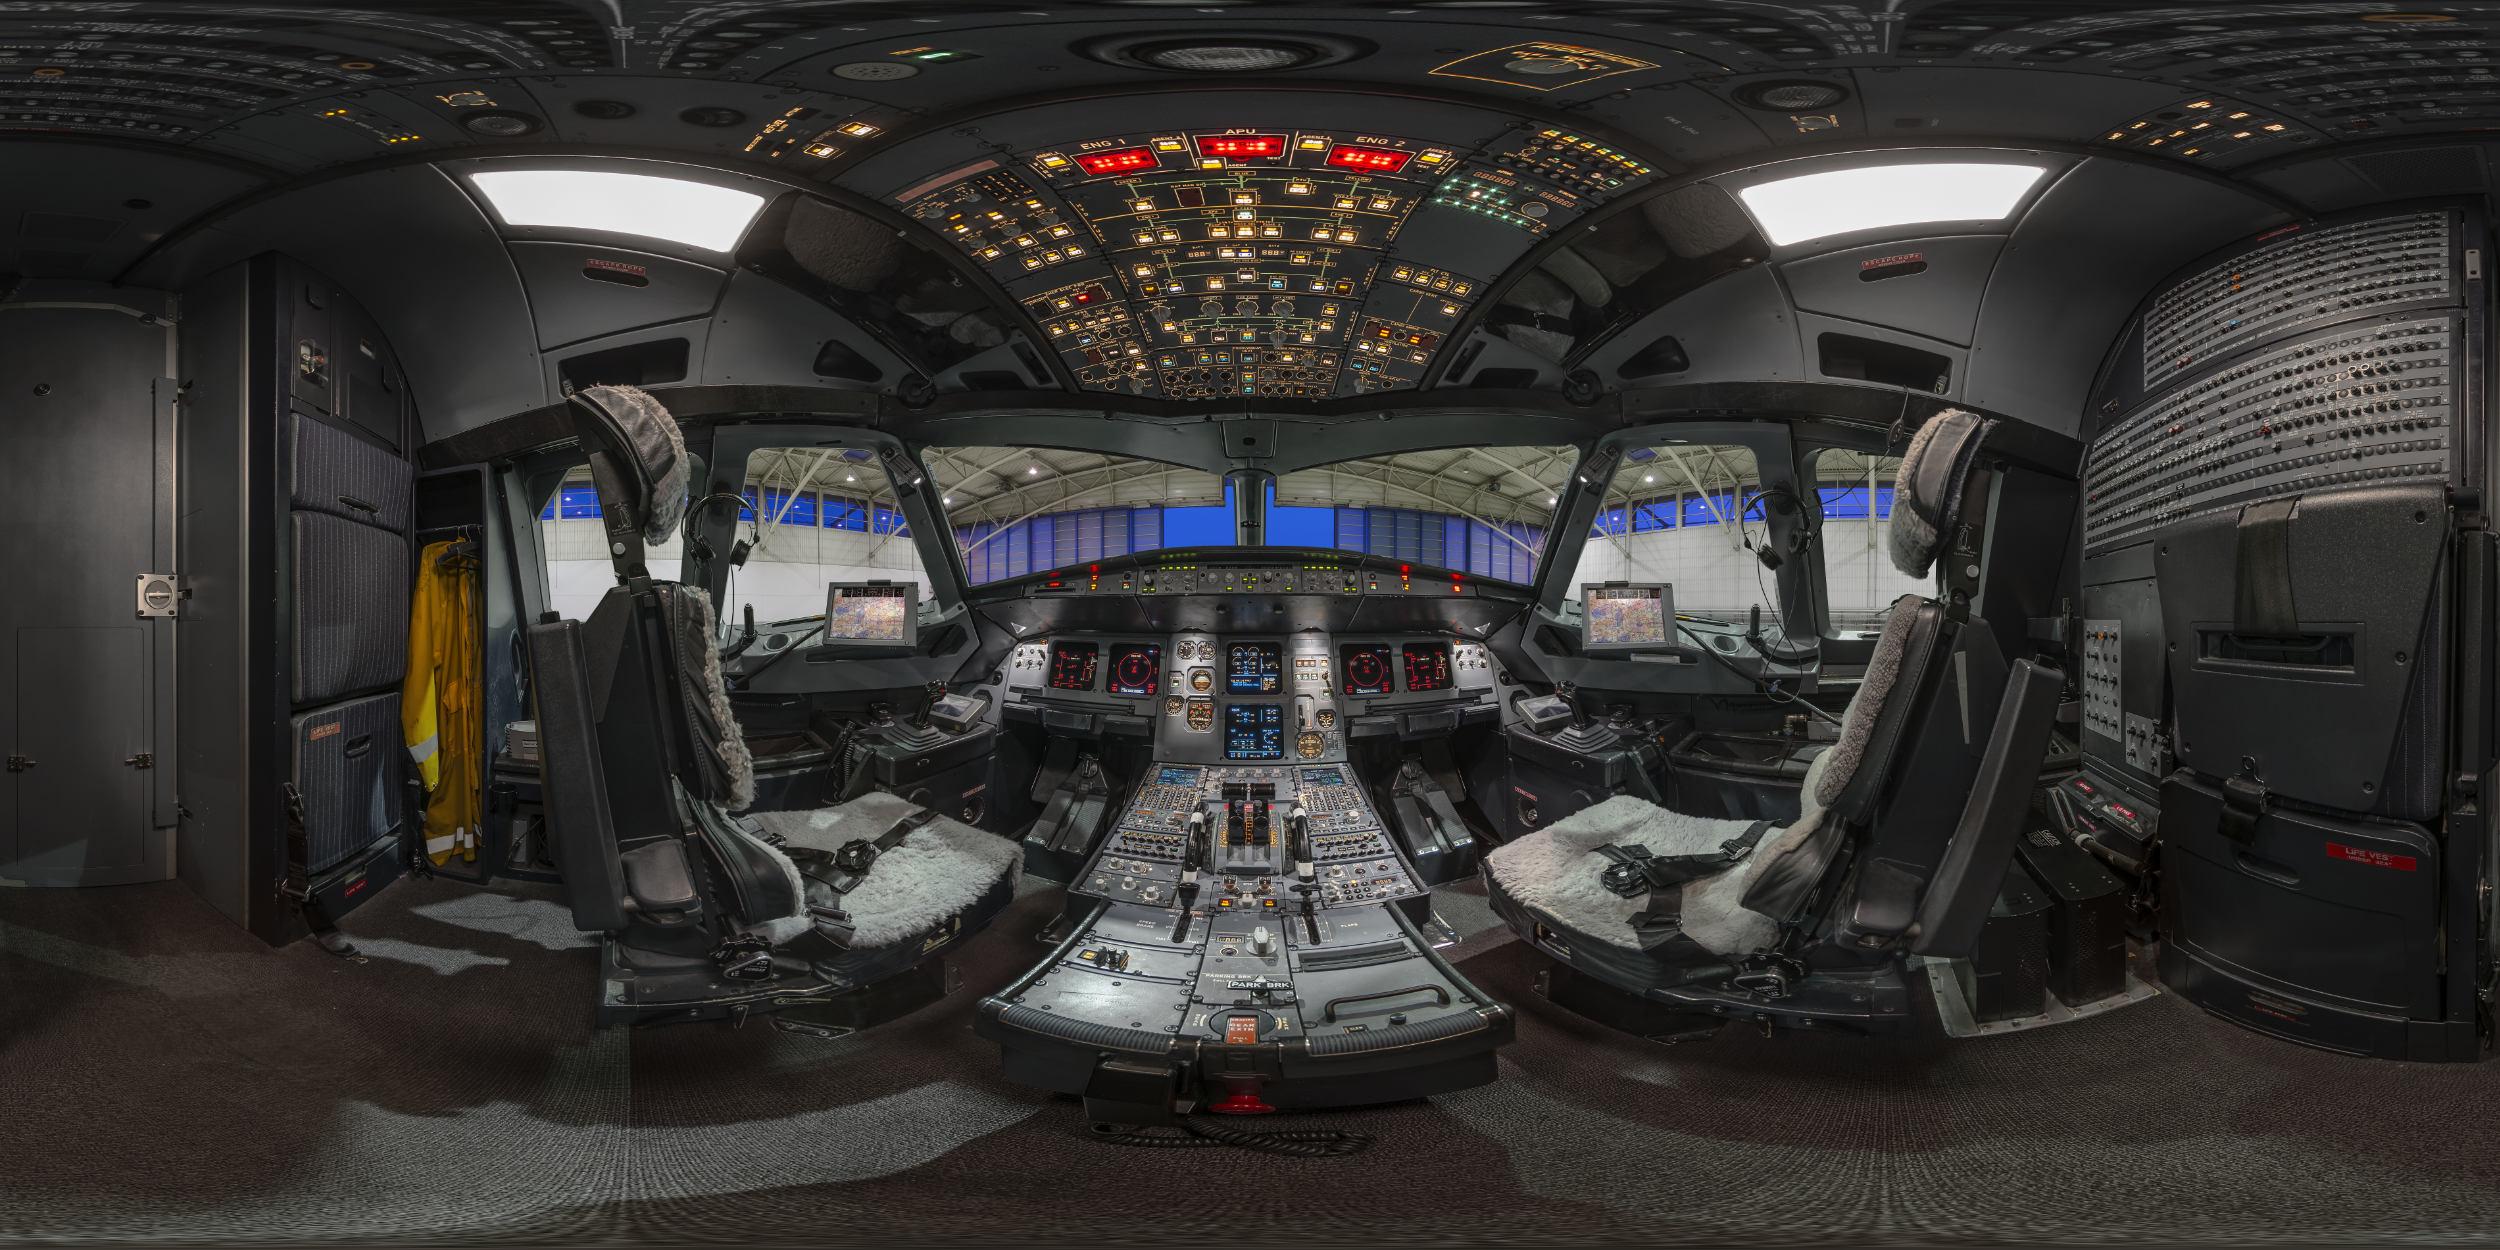 Panoramafotografie Virtuelle Touren 360Grad Fotografie Stuttgart und Umgebung Panorama 360°x180° Sphäre Flughafen Stuttgart LufthansaTechnik Airbus A320 Erfurt Cockpit